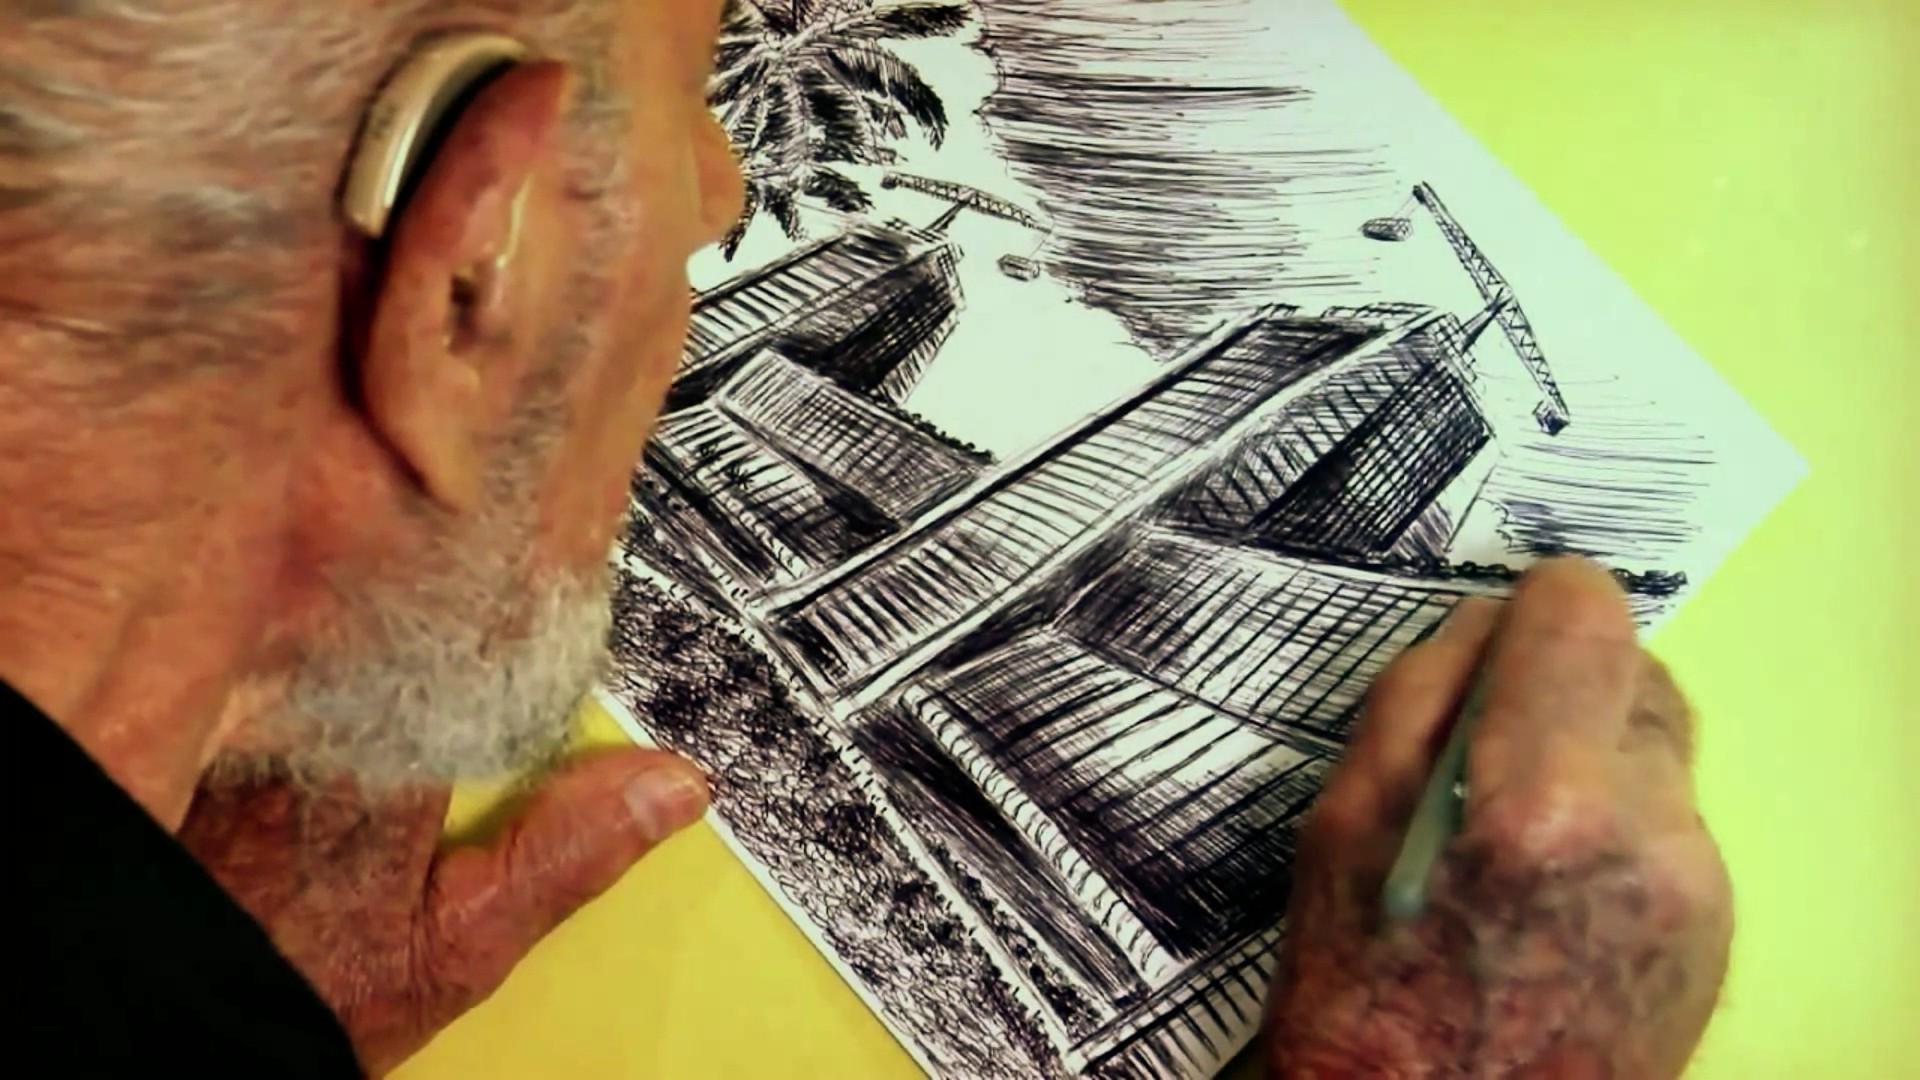 Jacque Fresco – Technical Revolution